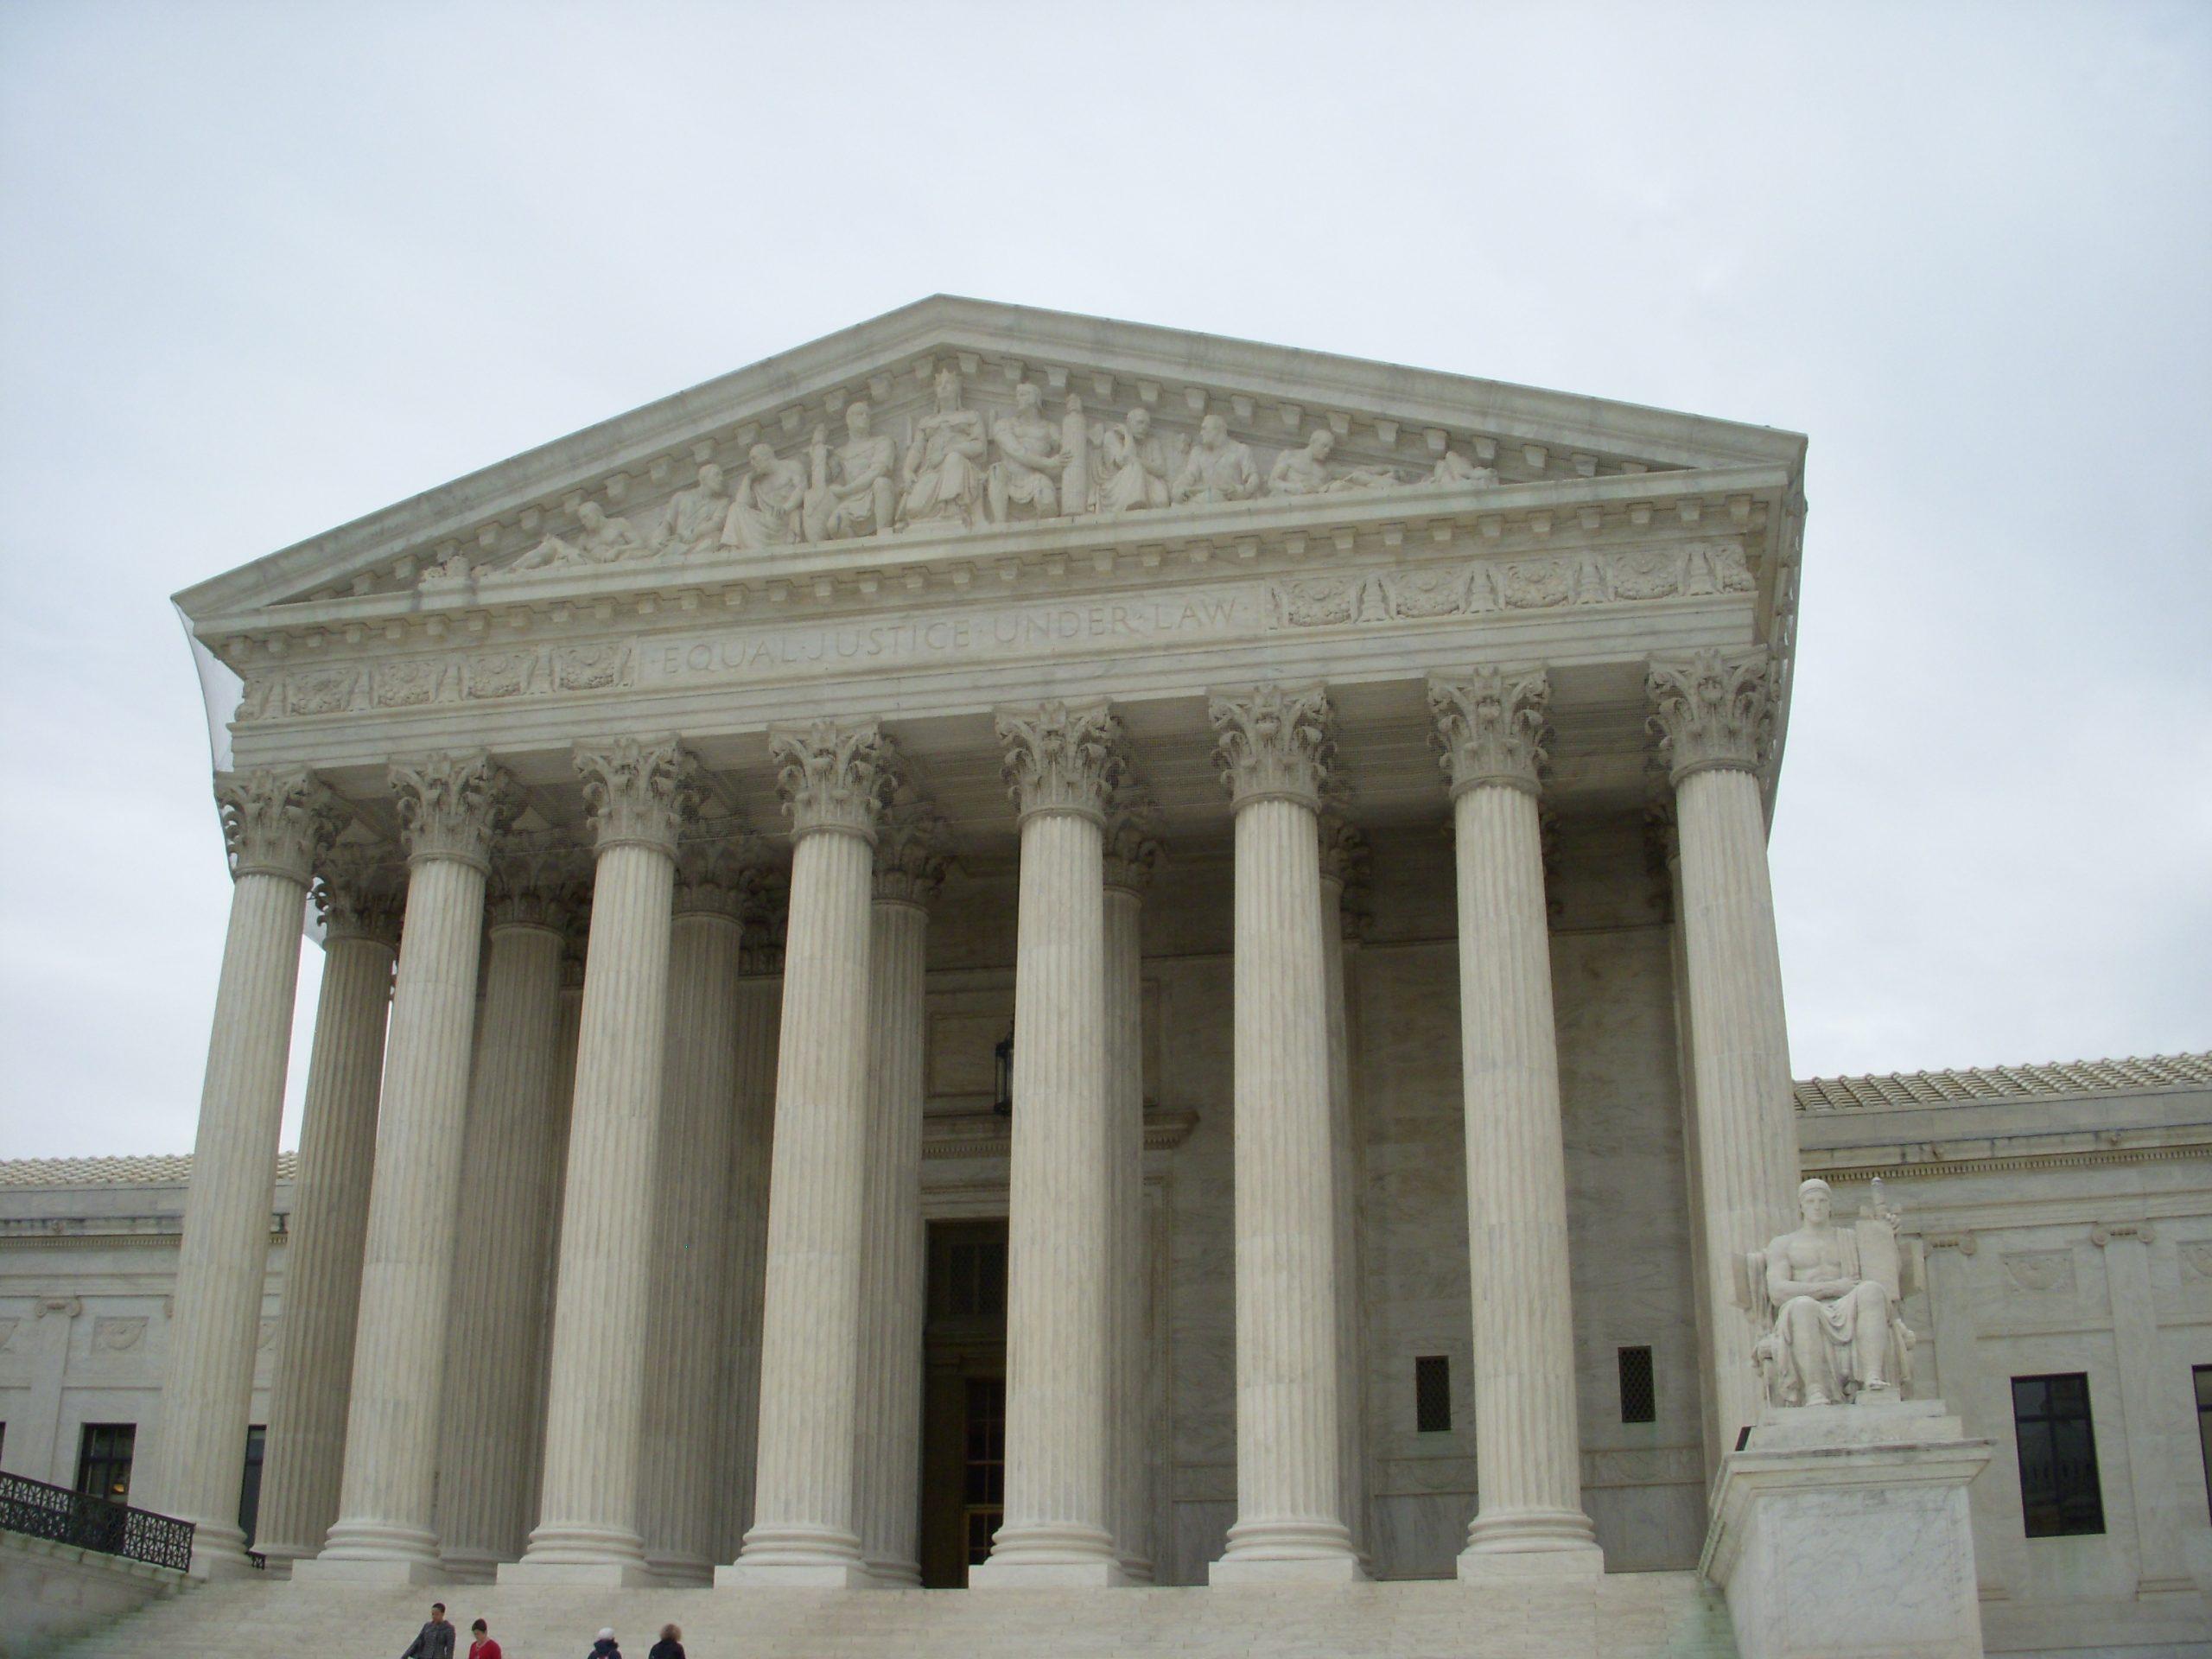 Brnovich v. Democratic National Committee (US Supreme Court)